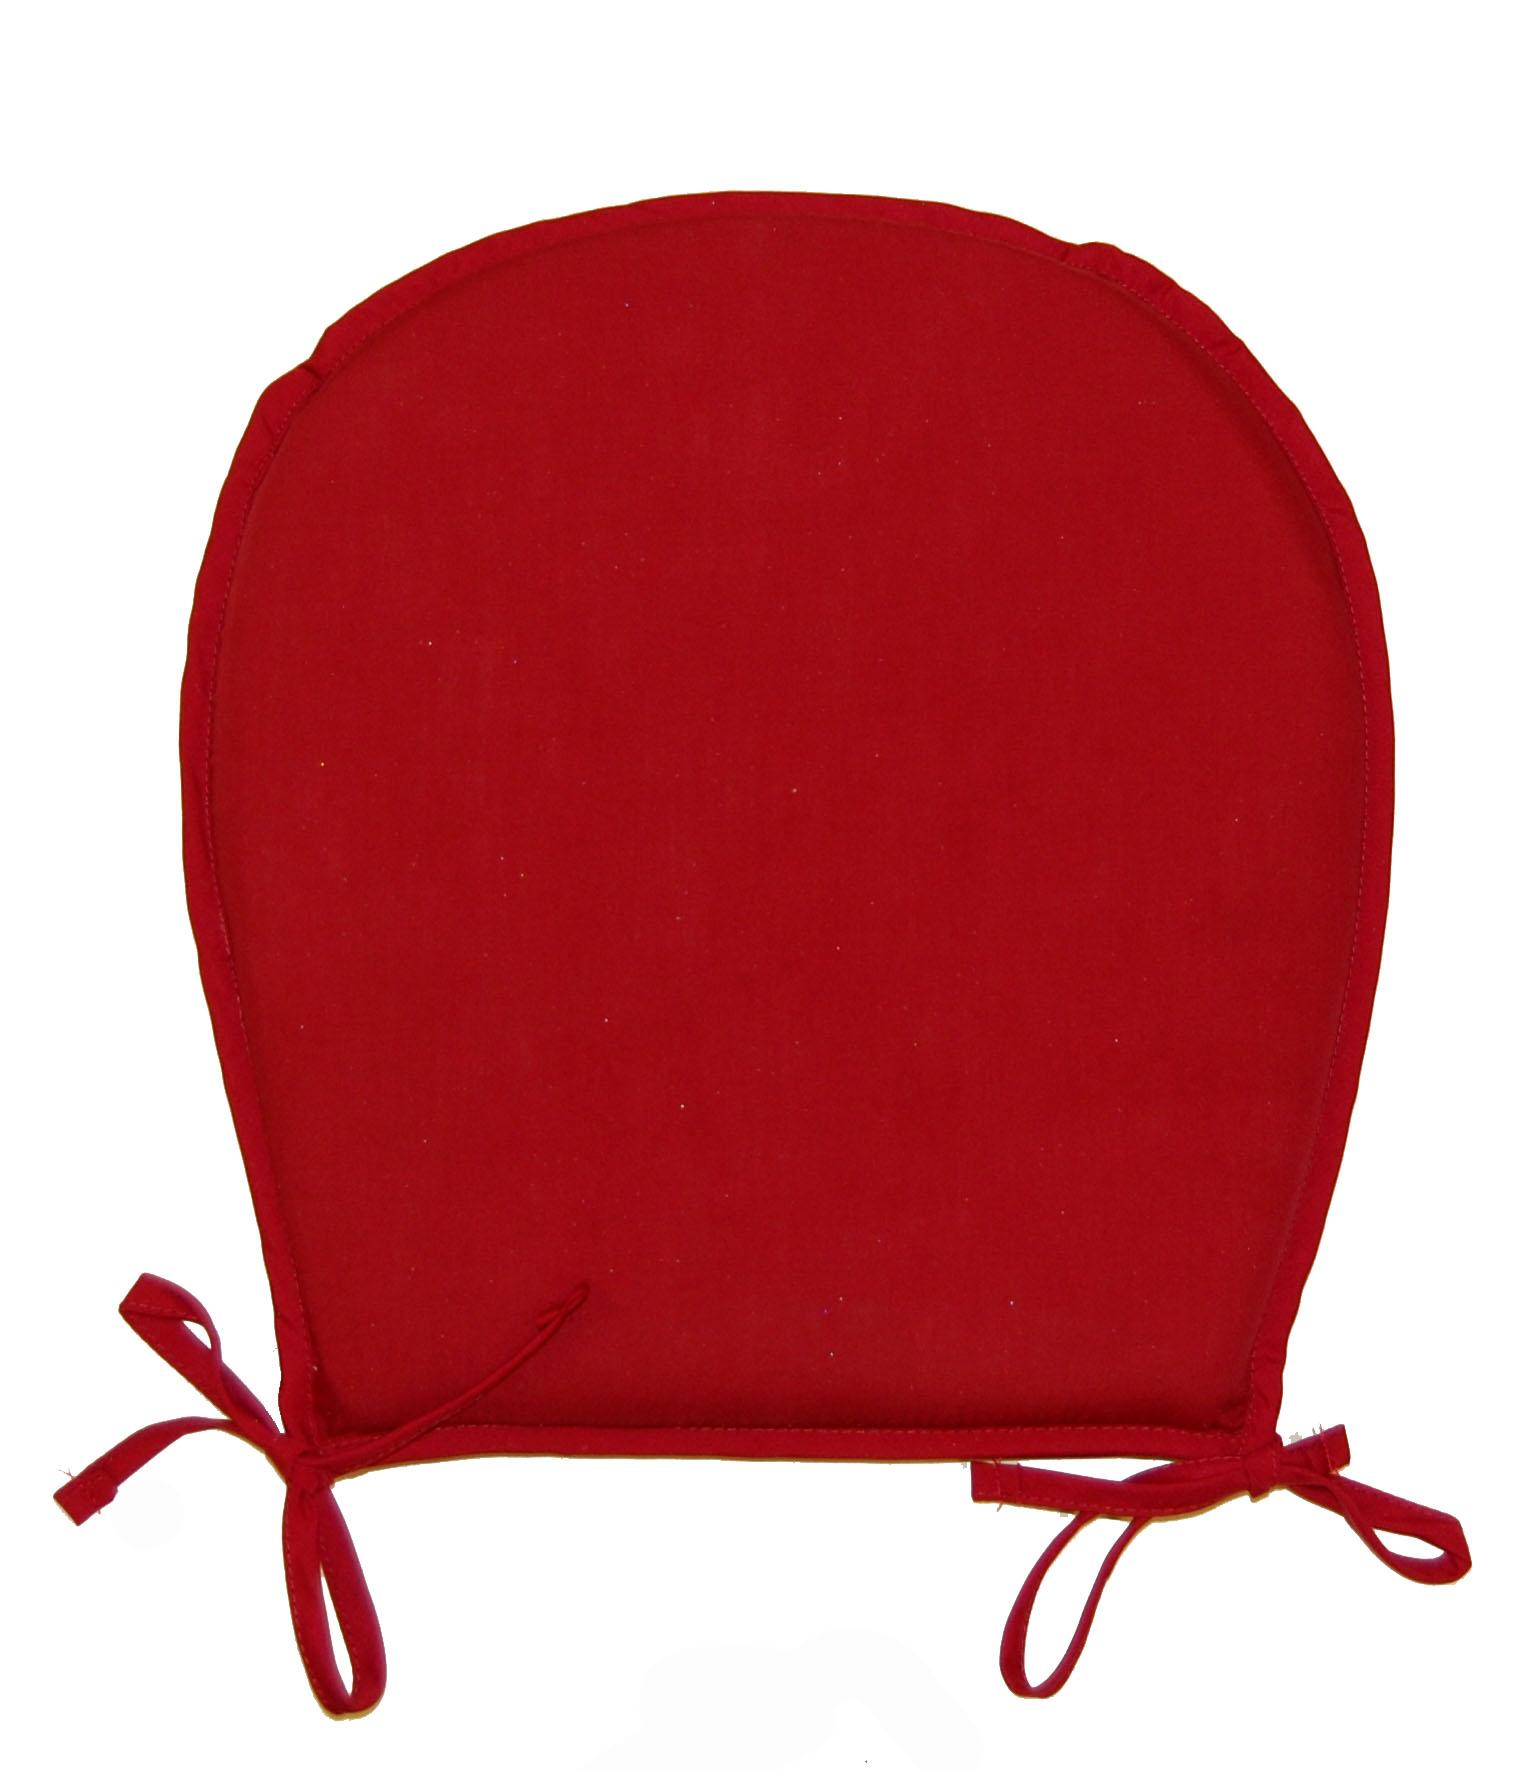 kitchen chair pads kitchen chair cushions Kitchen chair pads Photo 7